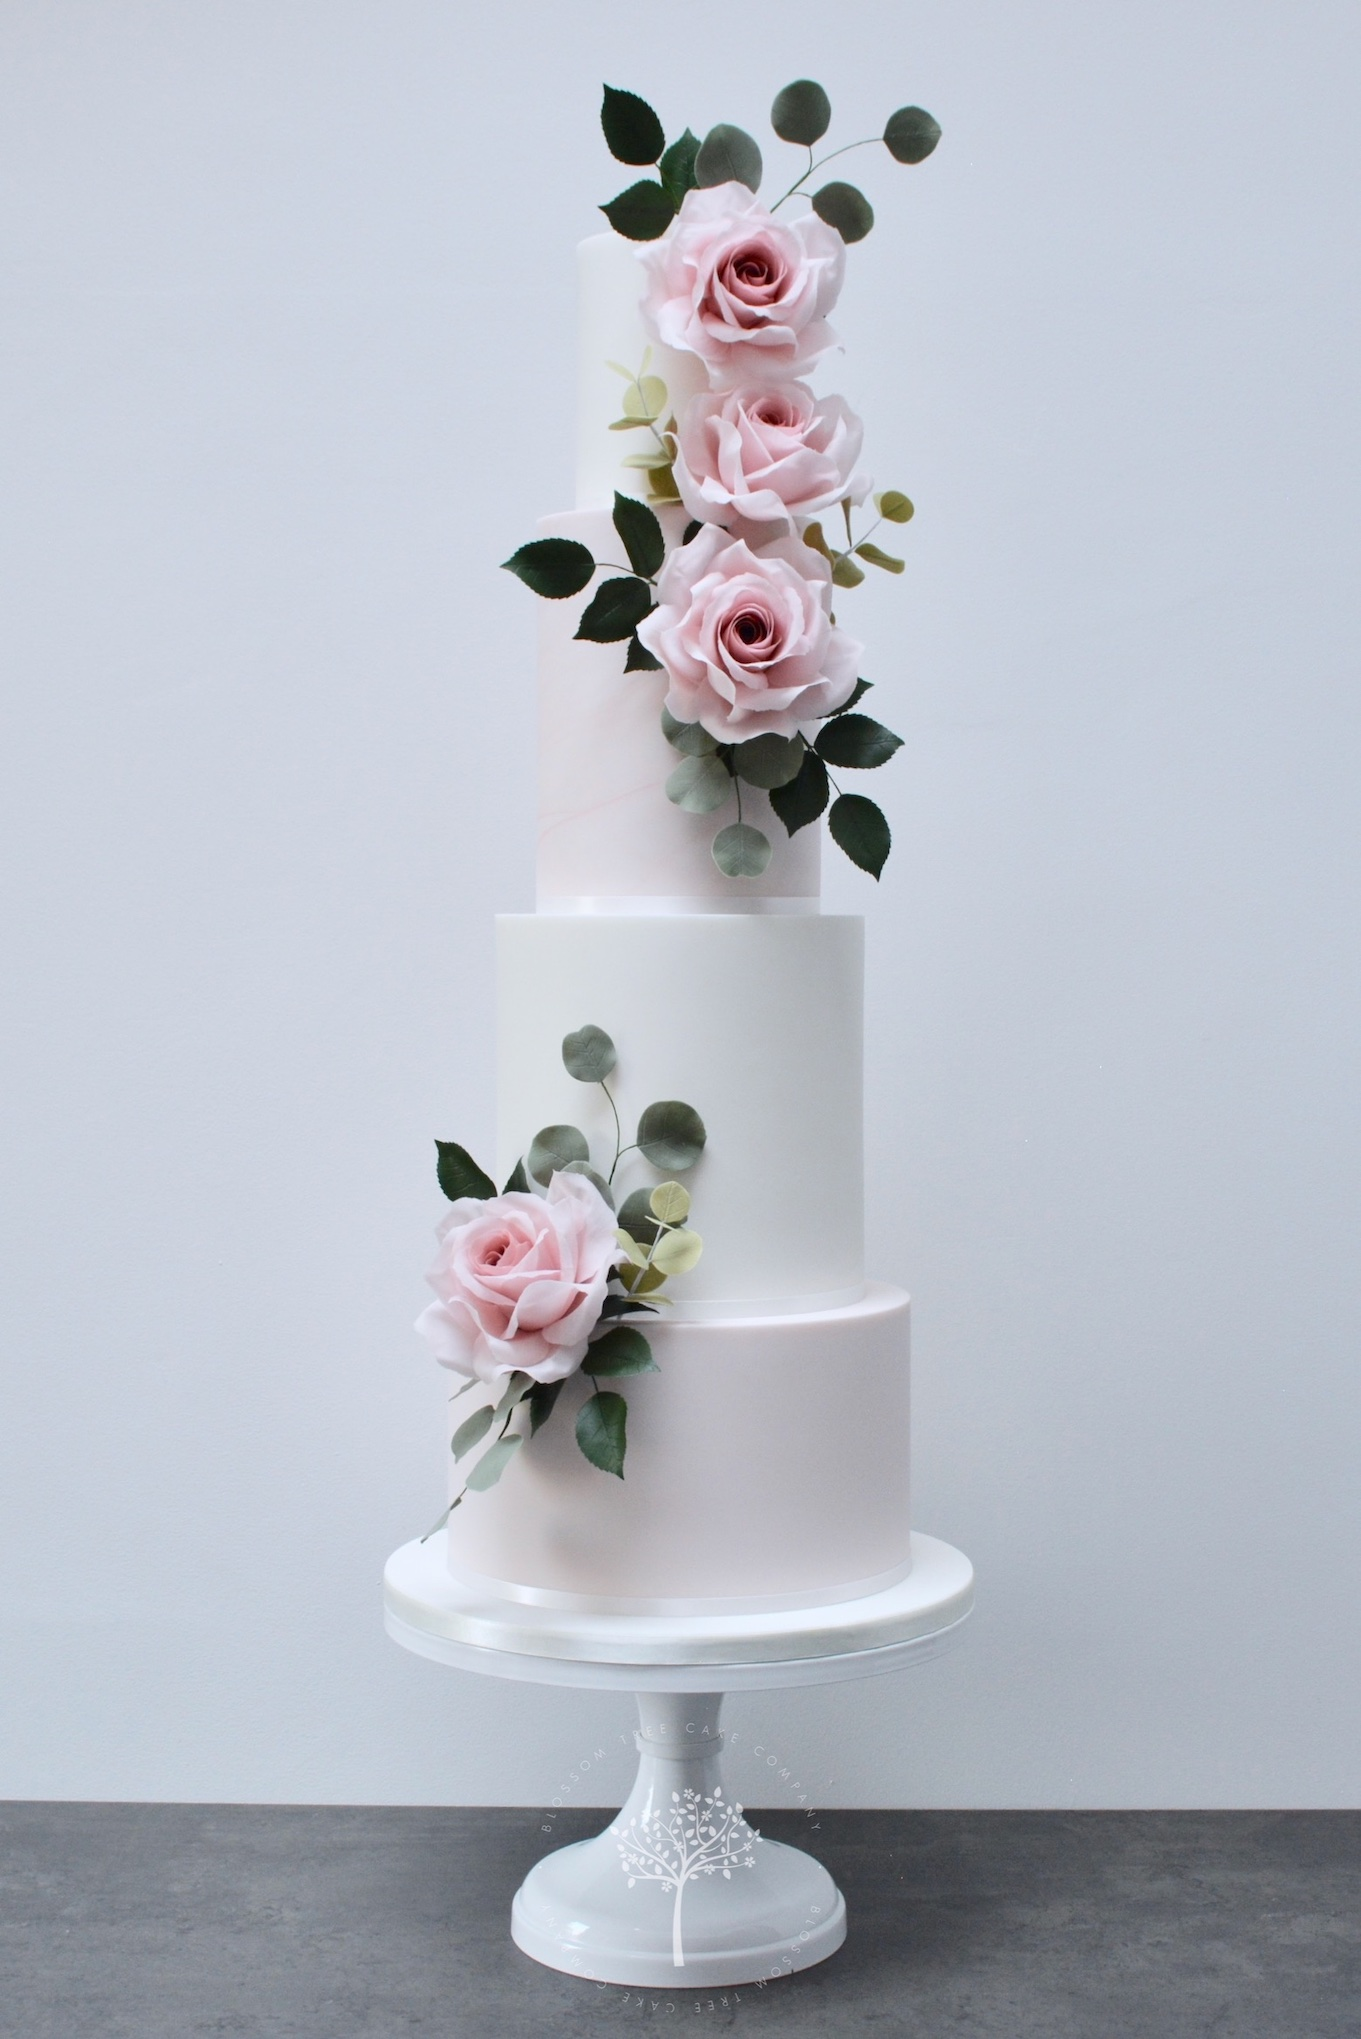 Garden Rose wedding cake by Blossom Tree Cake Company Harrogate North Yorkshire.jpg